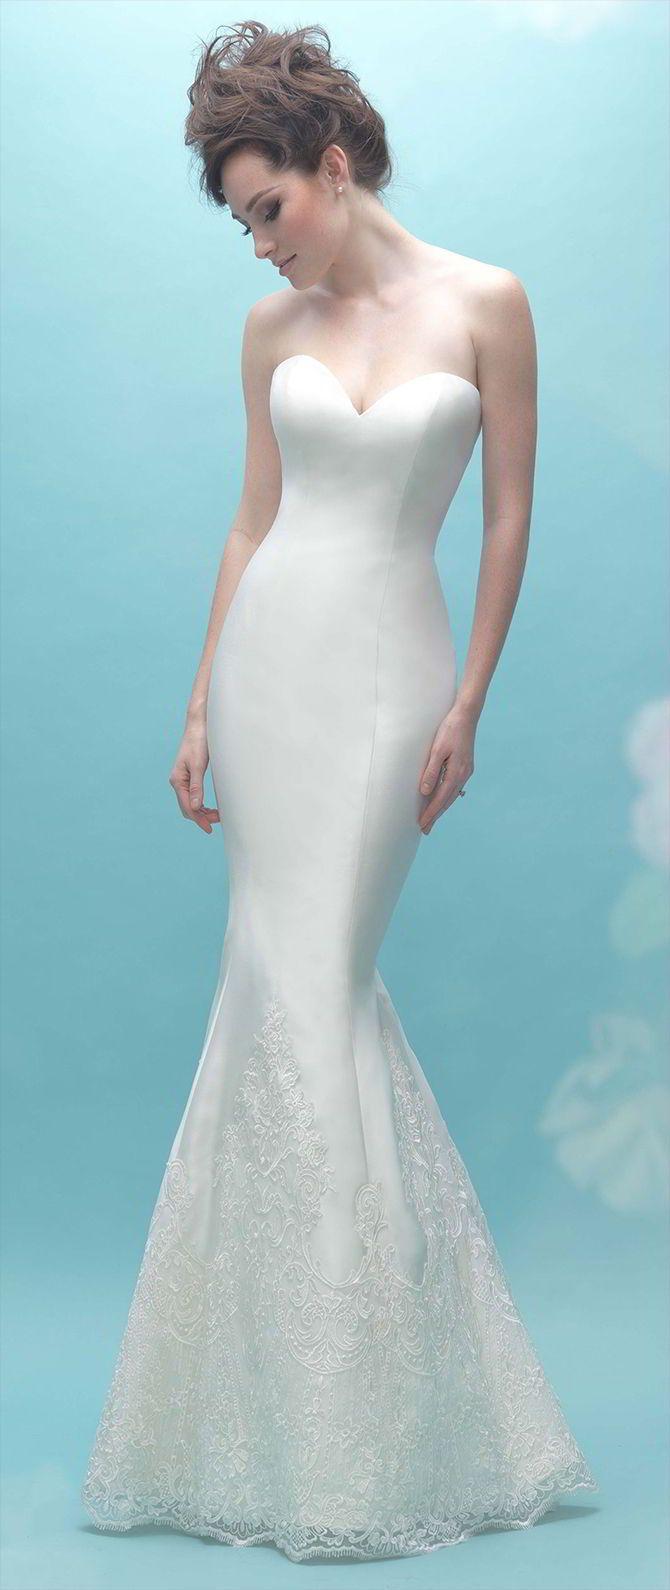 201 best Sheath Wedding Dresses images on Pinterest | Wedding ...